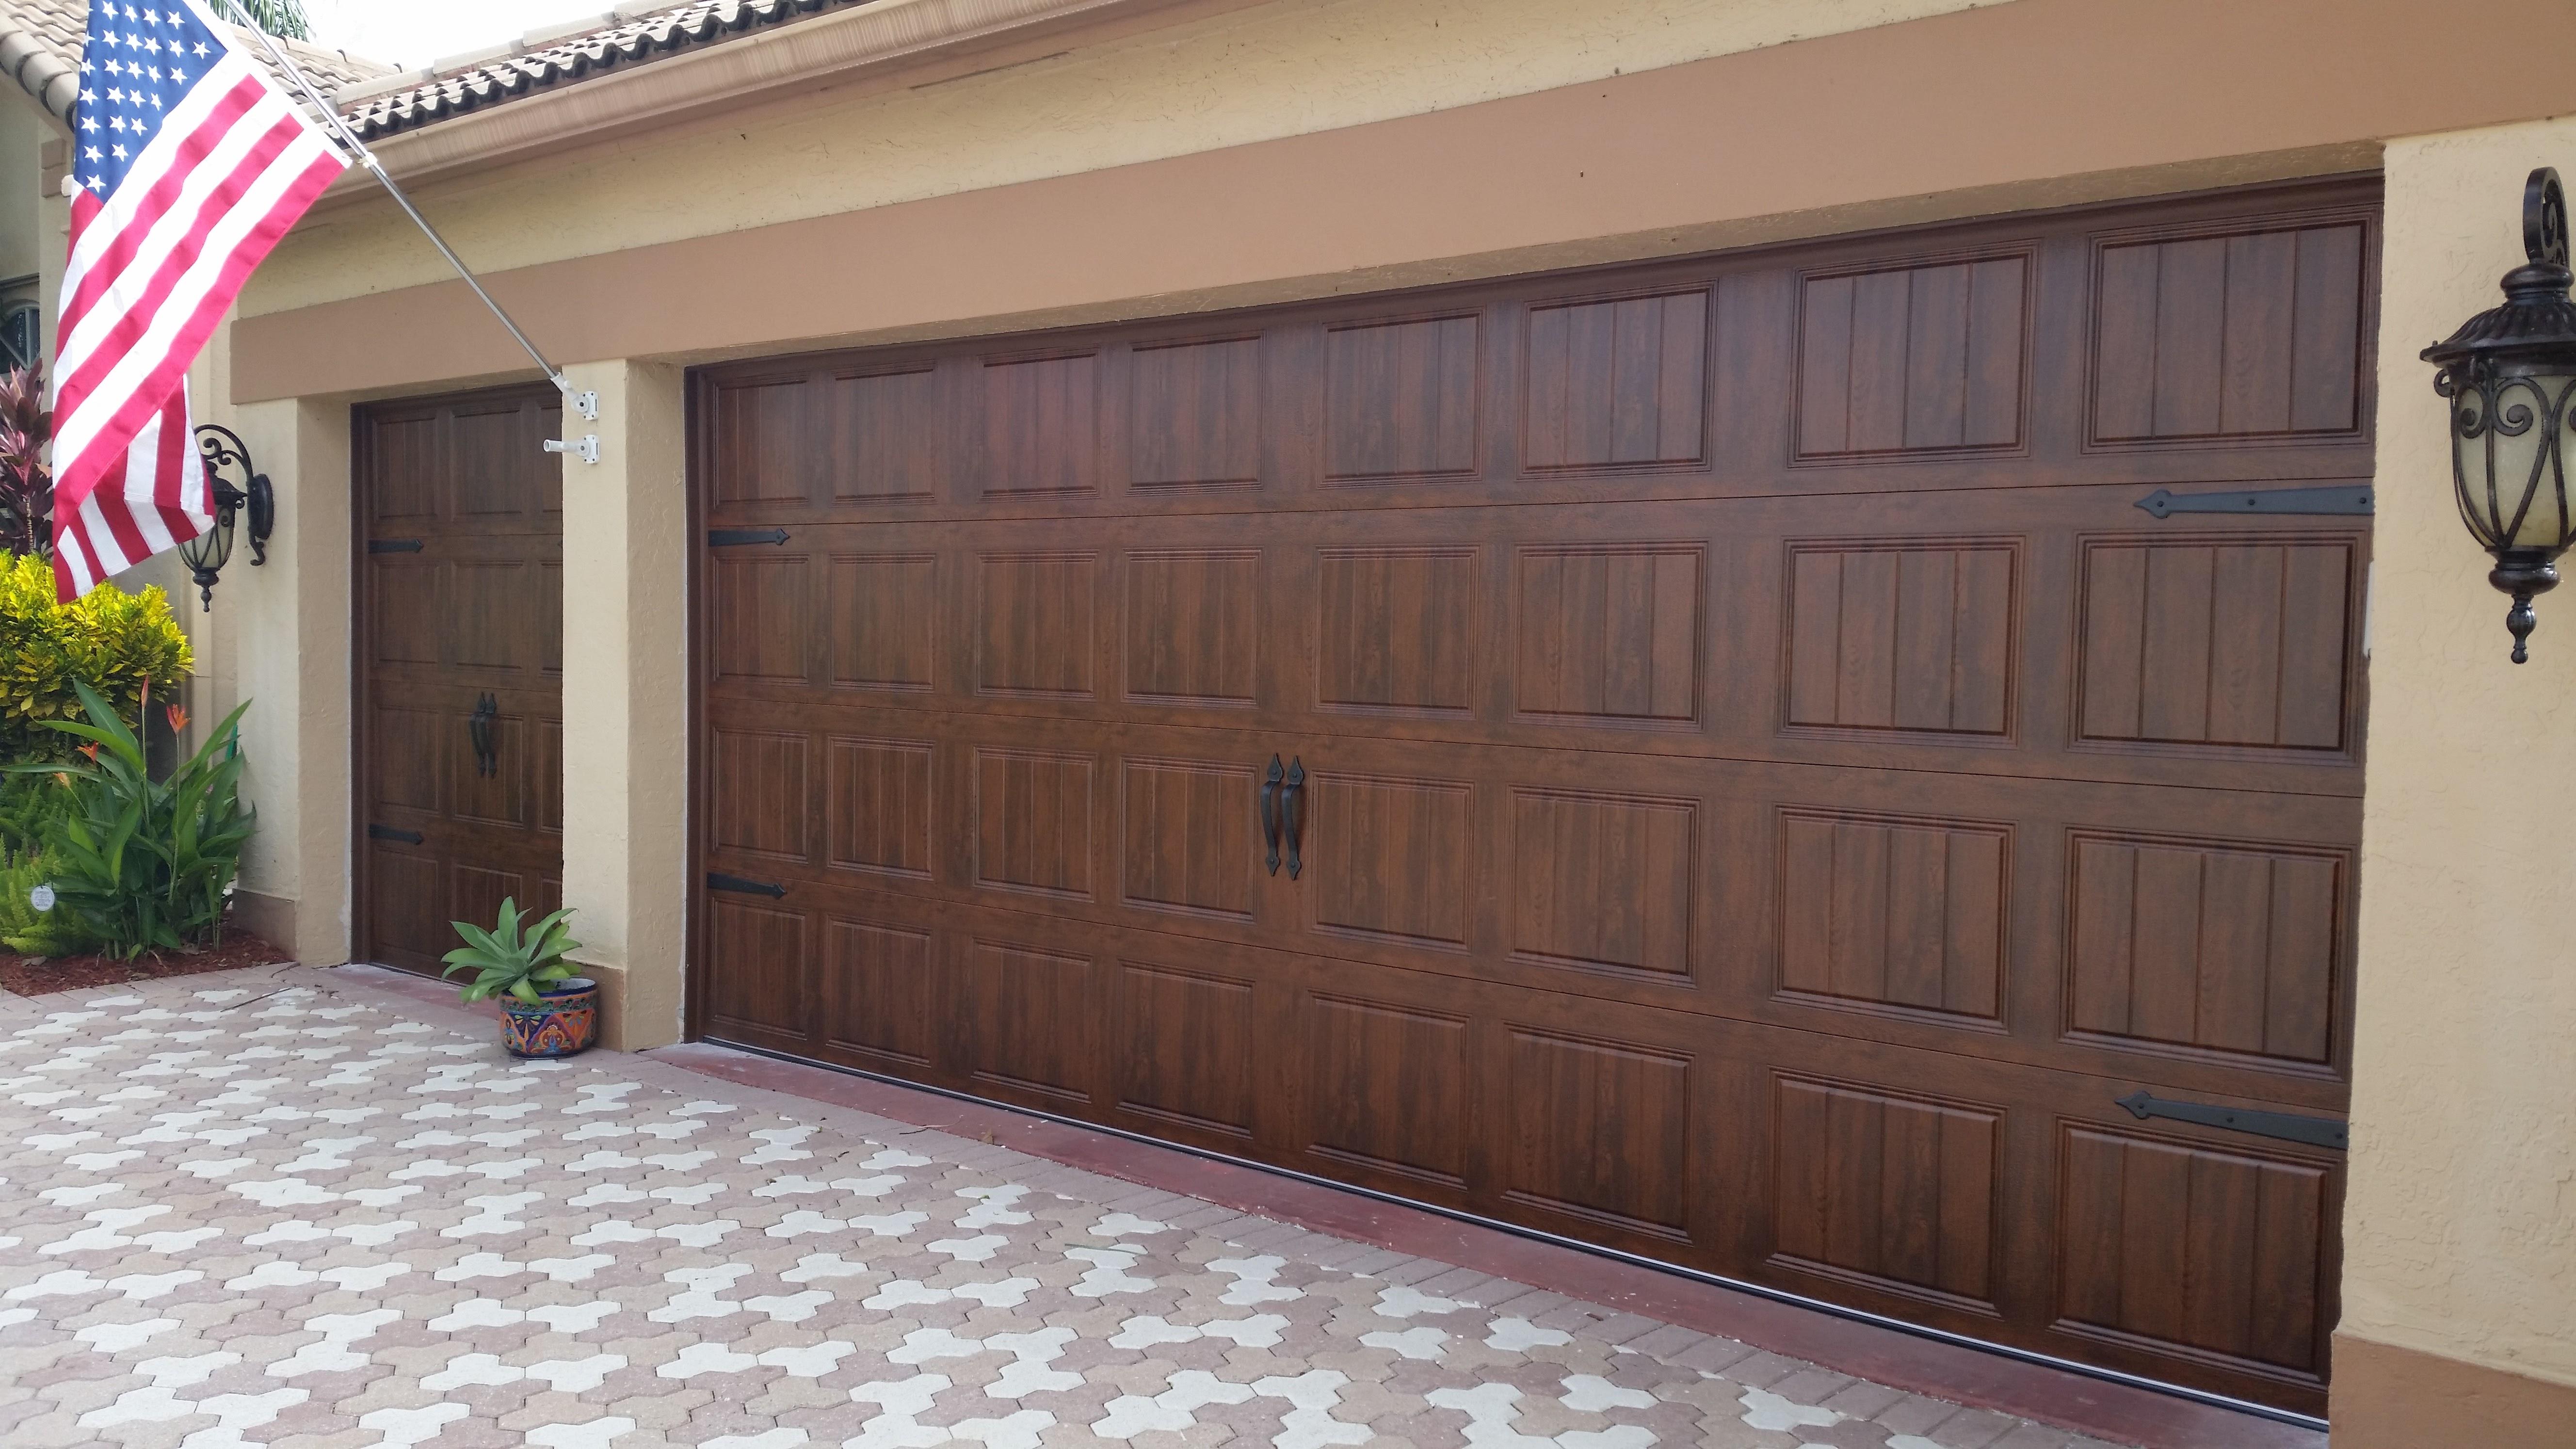 designs synthetic garage grass rooftop pines foliage little pool pembroke miracles repair door